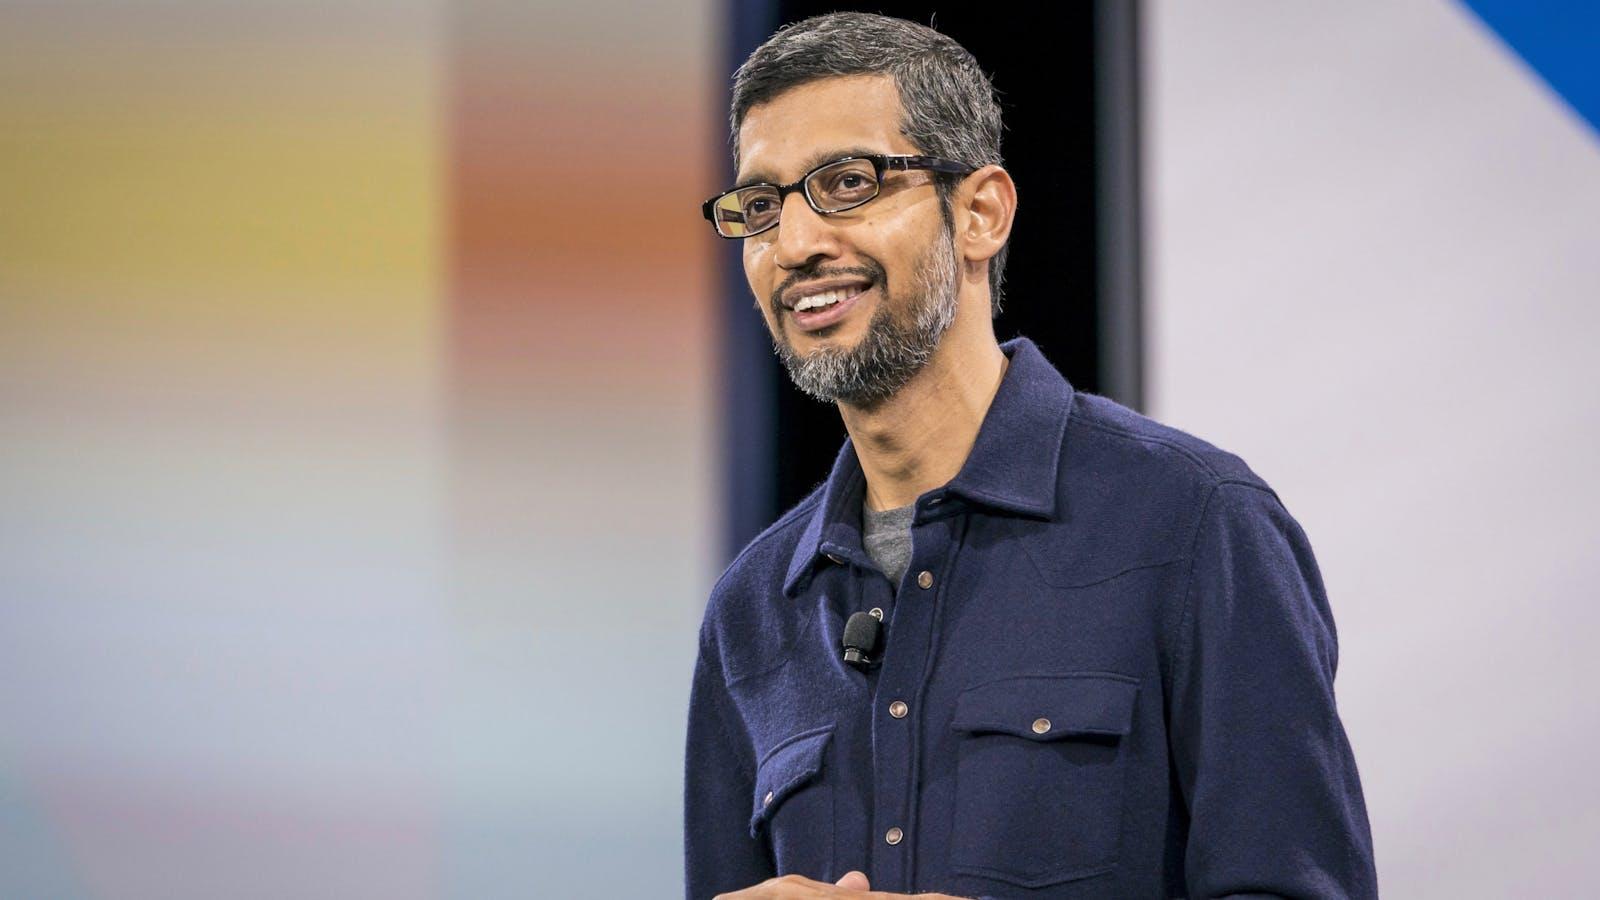 Google CEO Sundar Pichai. Photo by Bloomberg